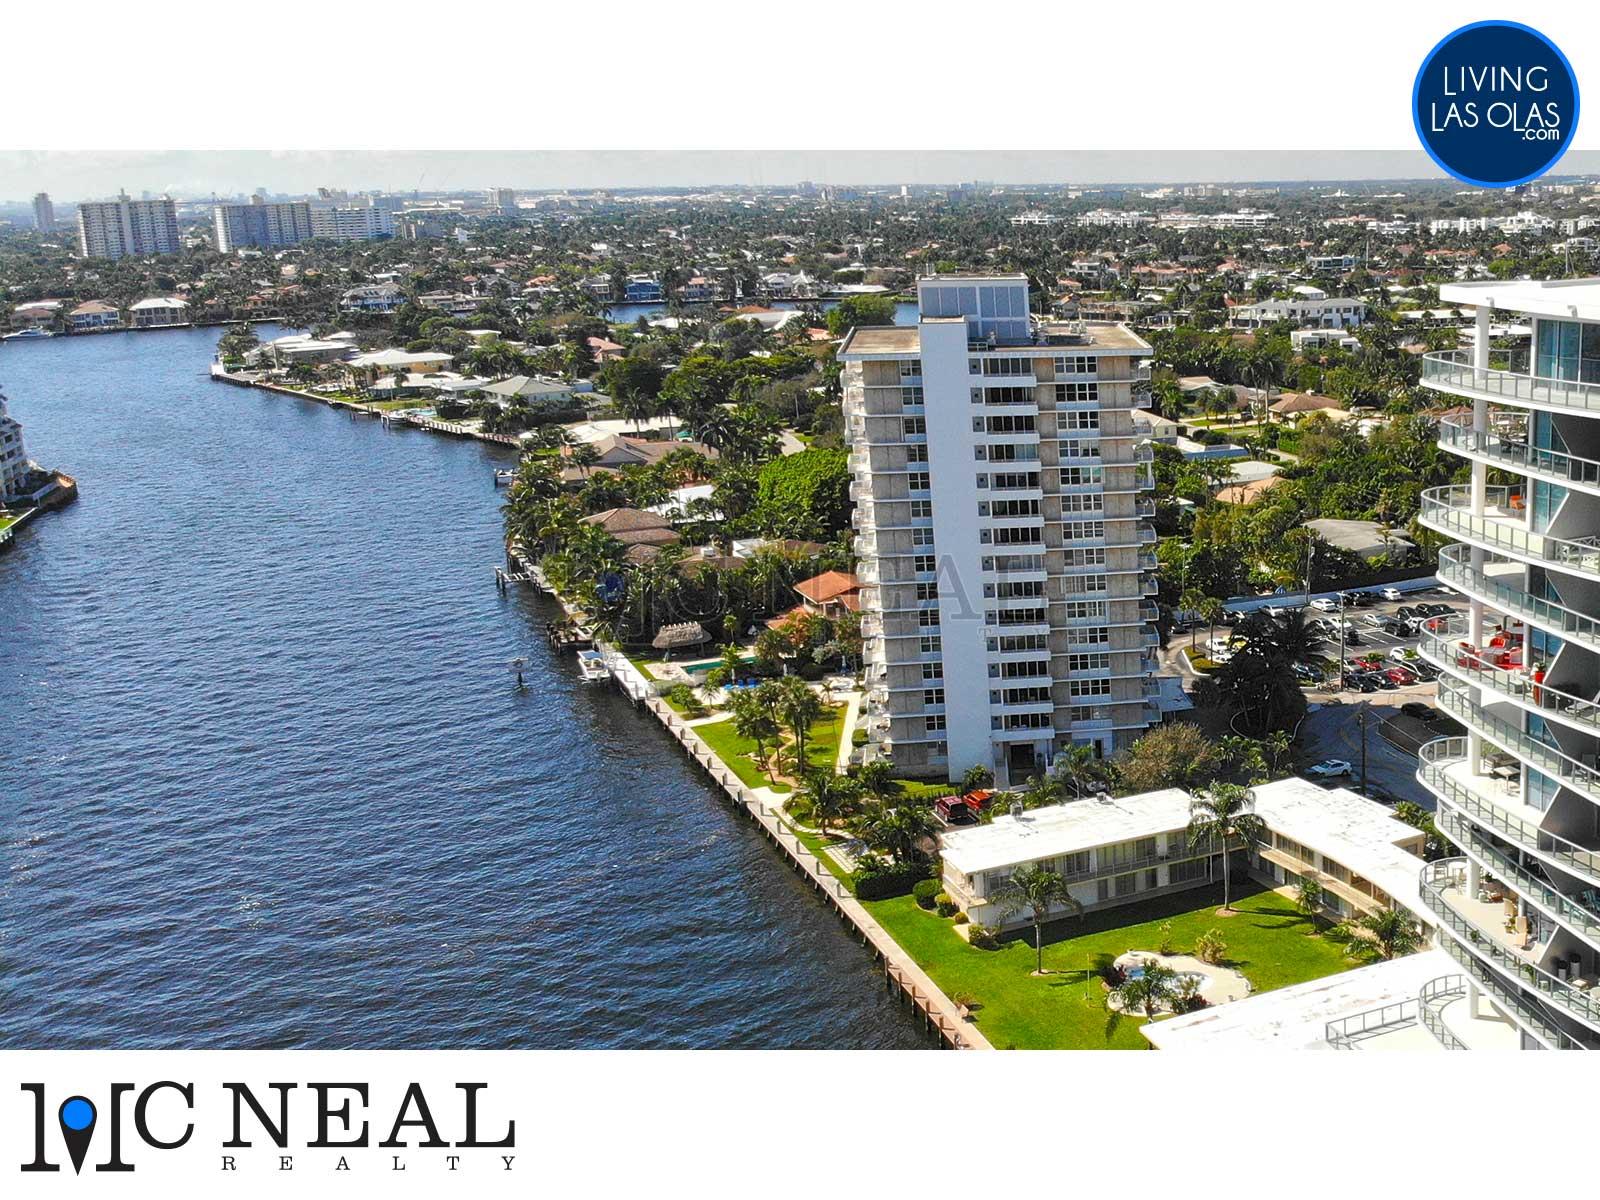 Sunrise Neighborhood Fort Lauderdale Homes Real Estate 06